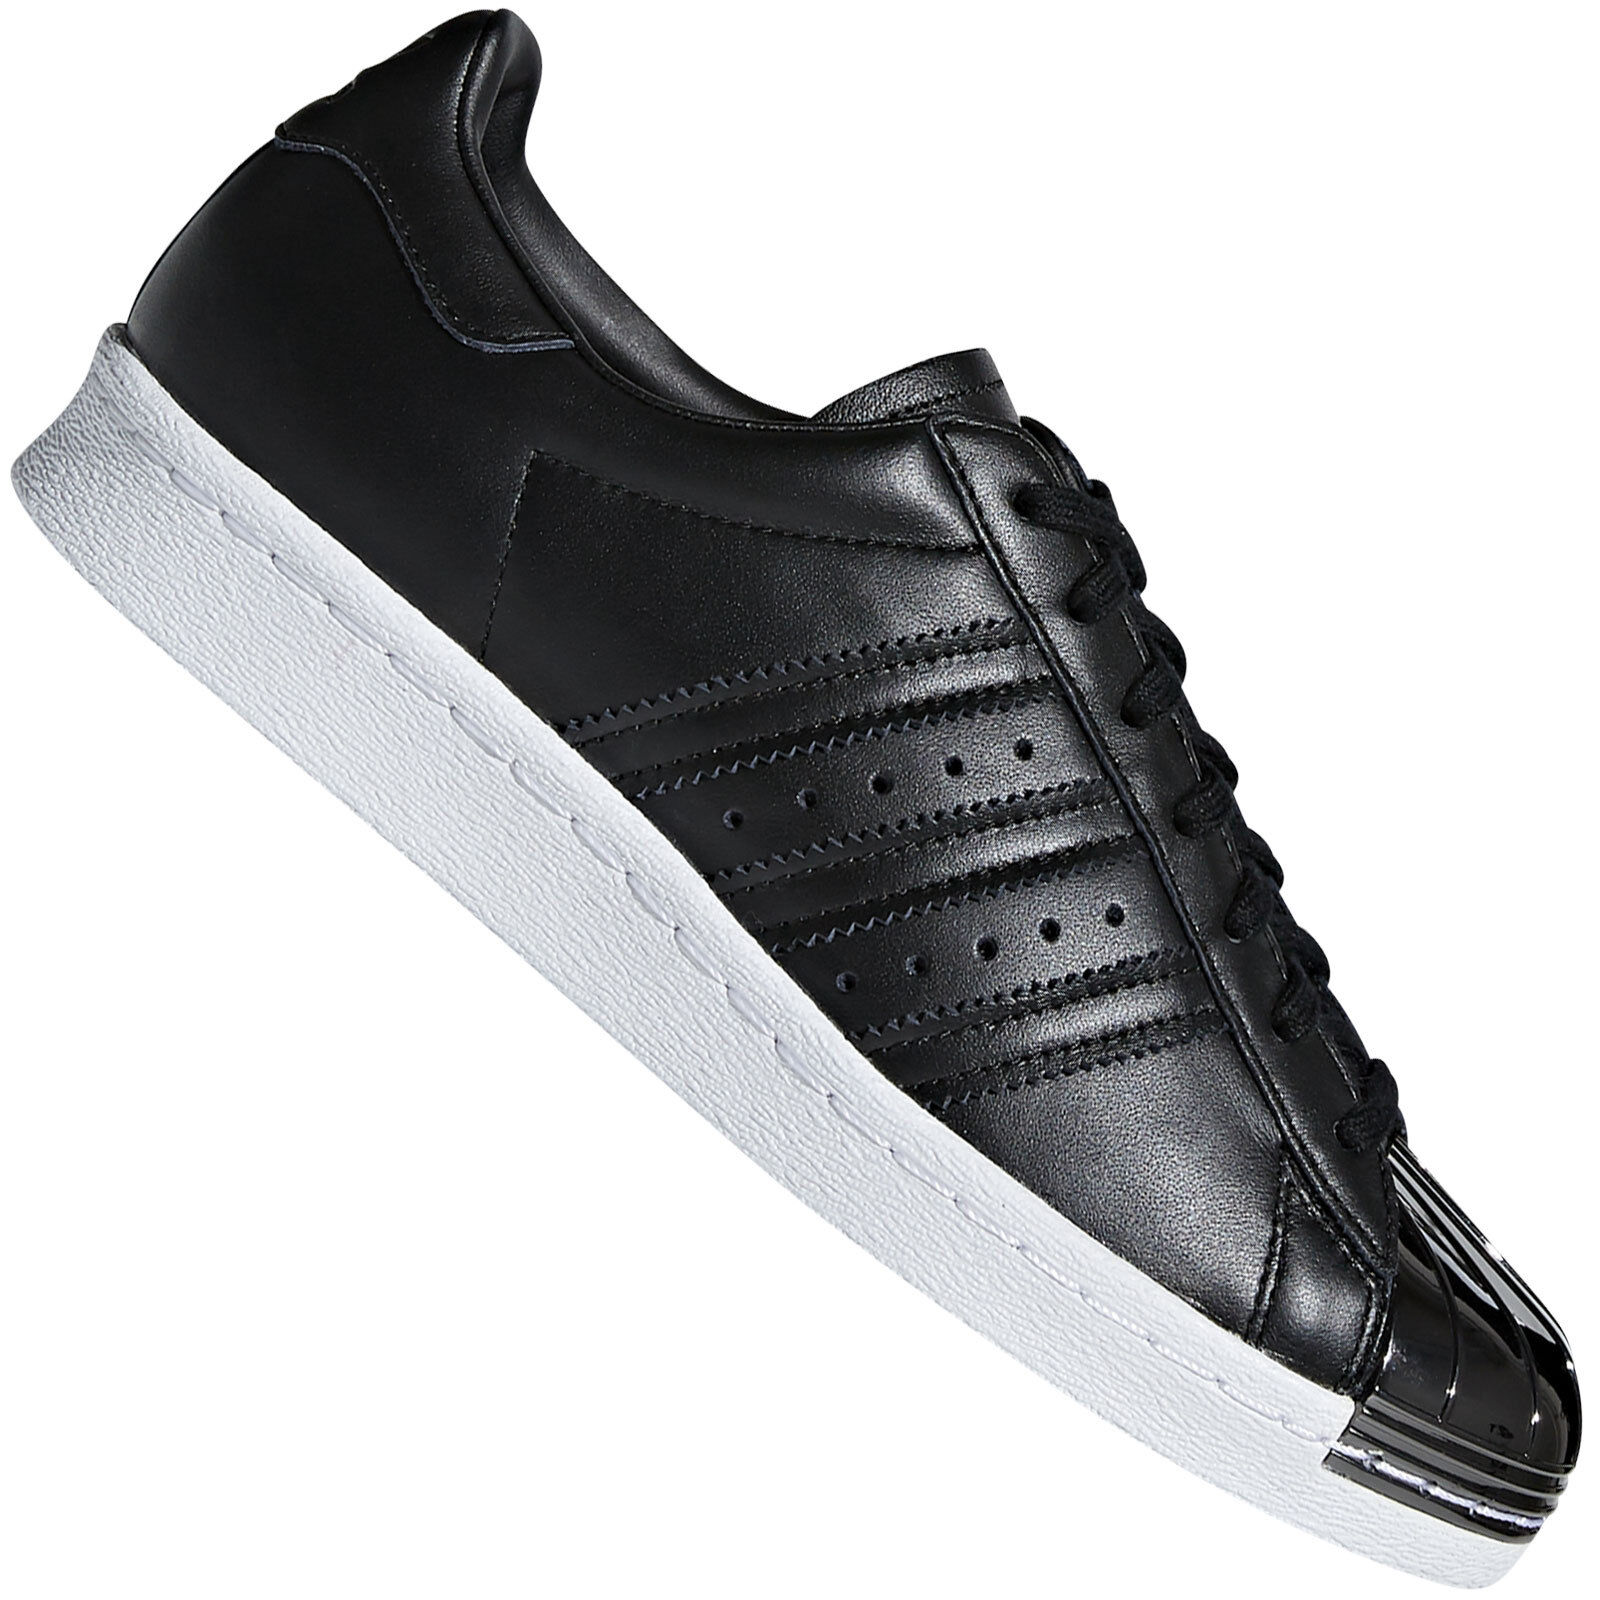 "Adidas Originals Superstar 80s Παπούτσια ΞœΞ΅Ο""αλλικά ΓυναικΡία ΓυναικΡία Παπούτσια Μαύρα ΞœΞ΅Ο""αλλικά Toe"